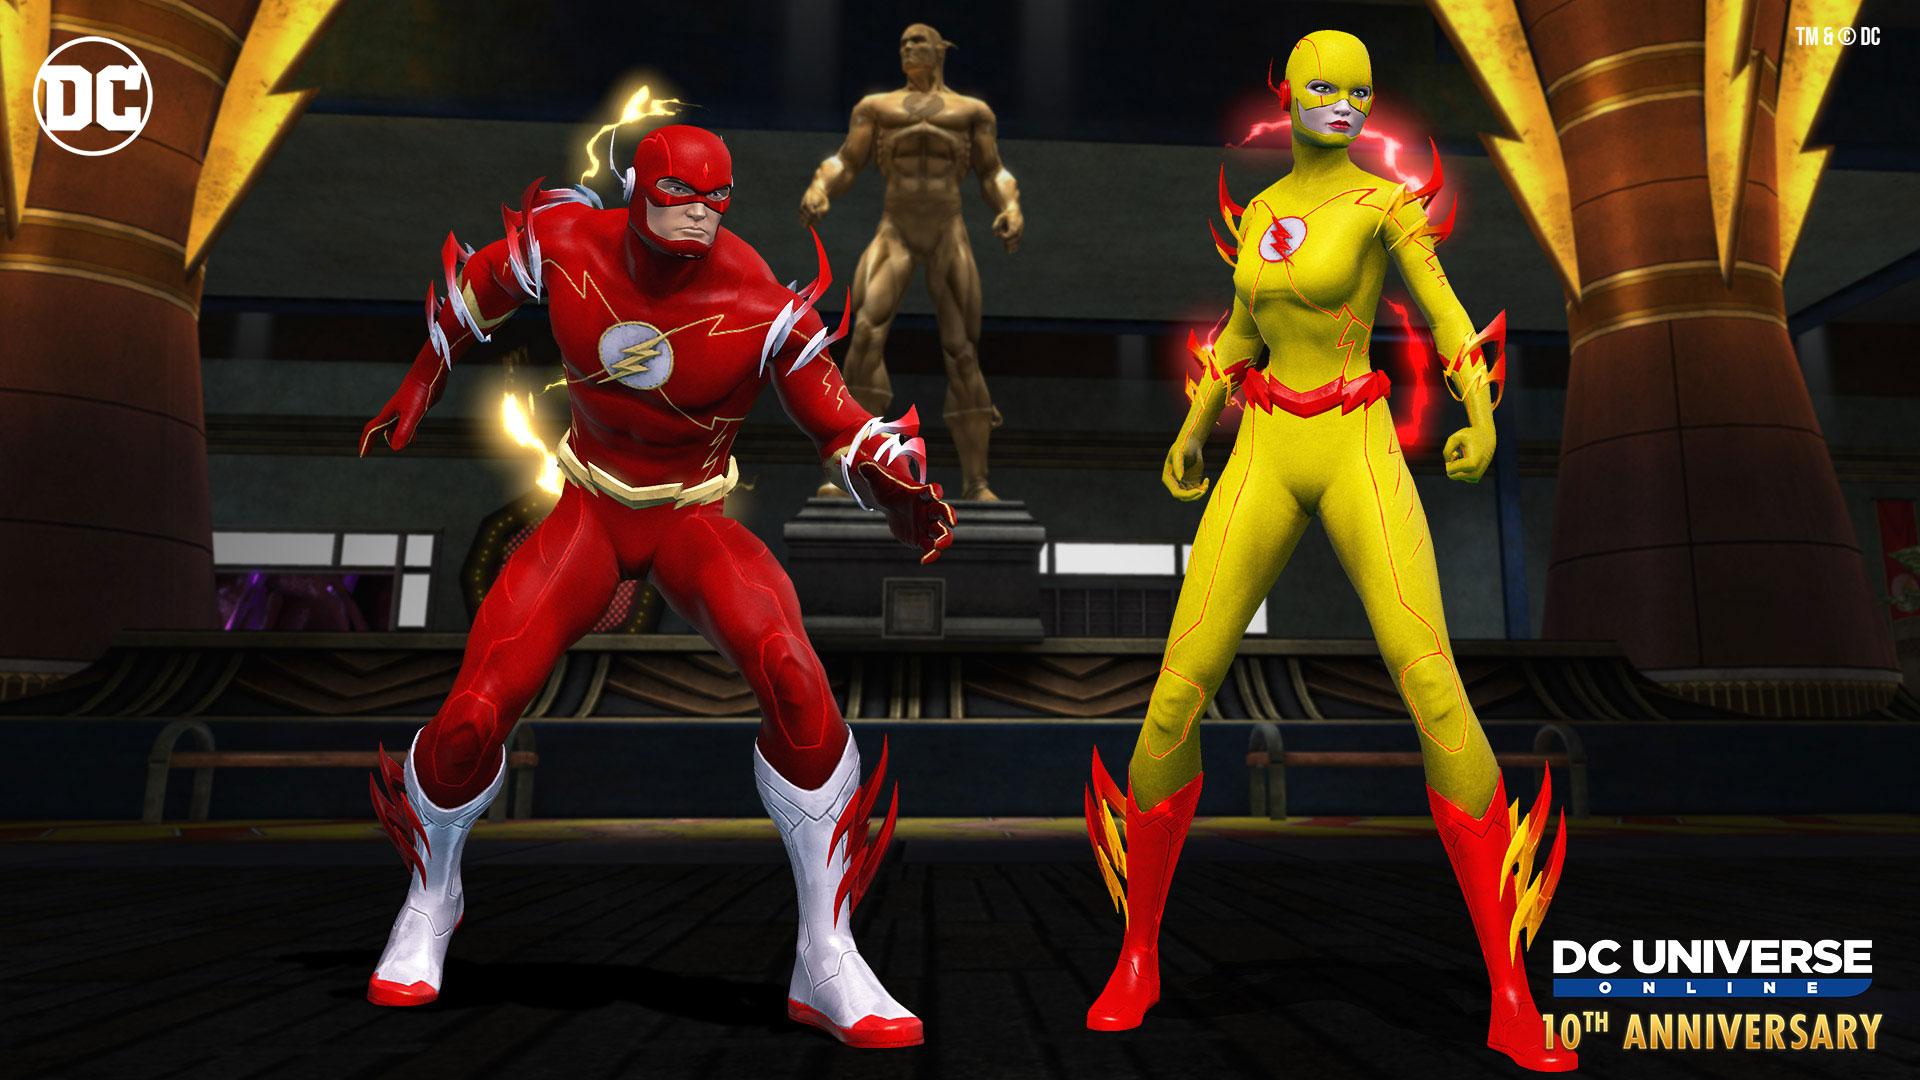 DC 10th Anniversary Costumes